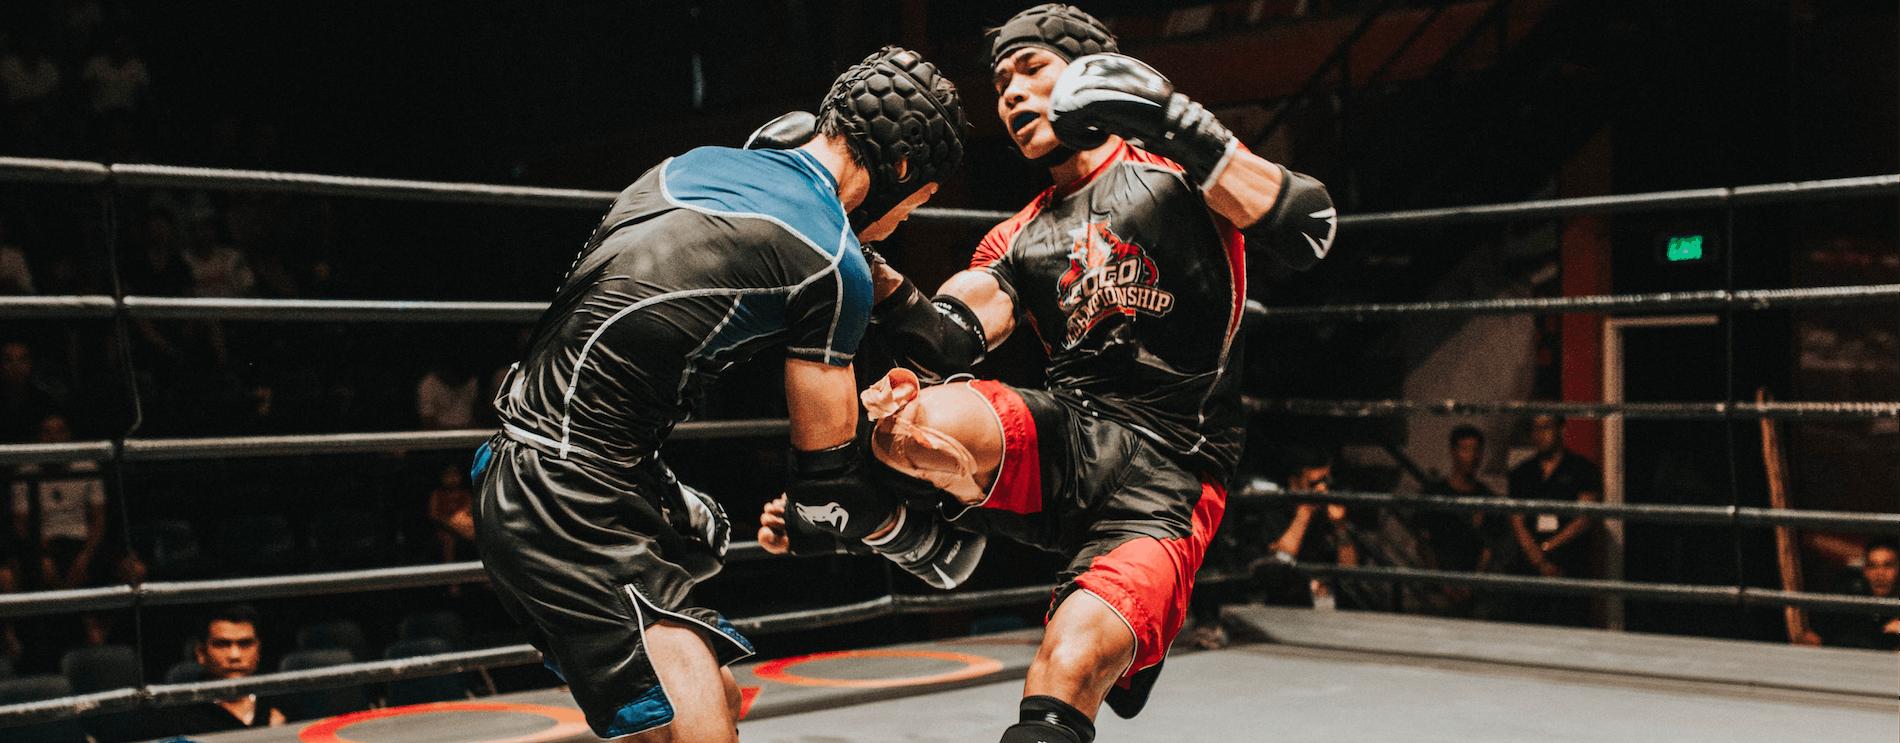 Wrestling Uniforms